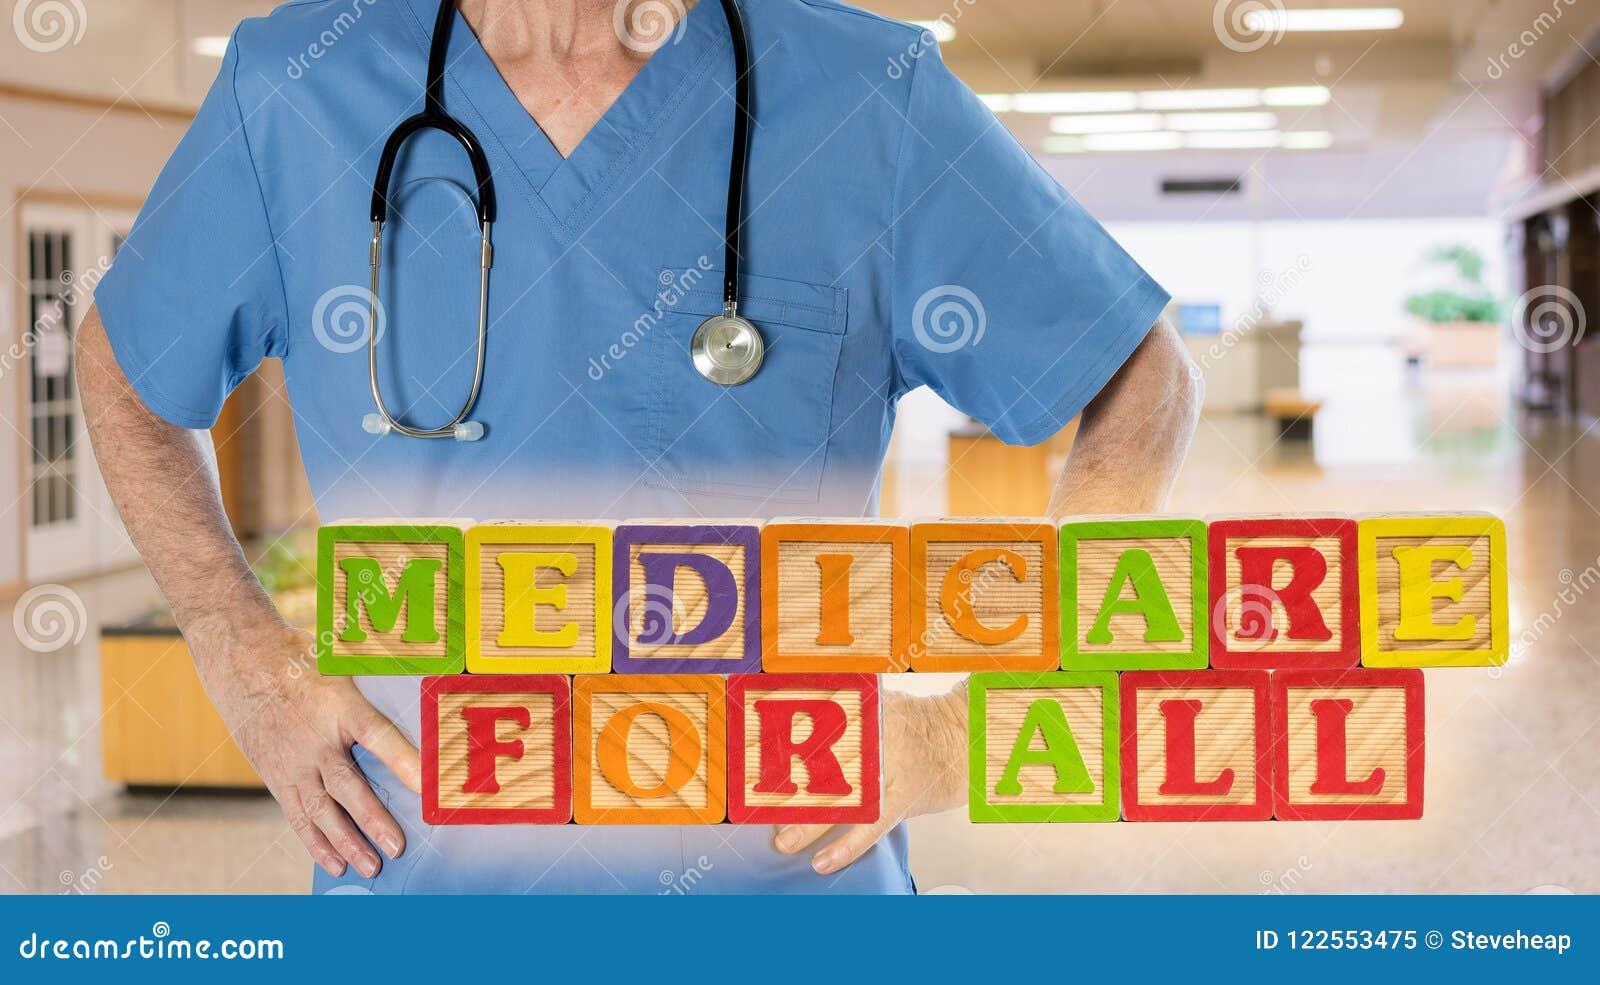 Medicare για όλο το μήνυμα που χτίζεται από τους ξύλινους φραγμούς